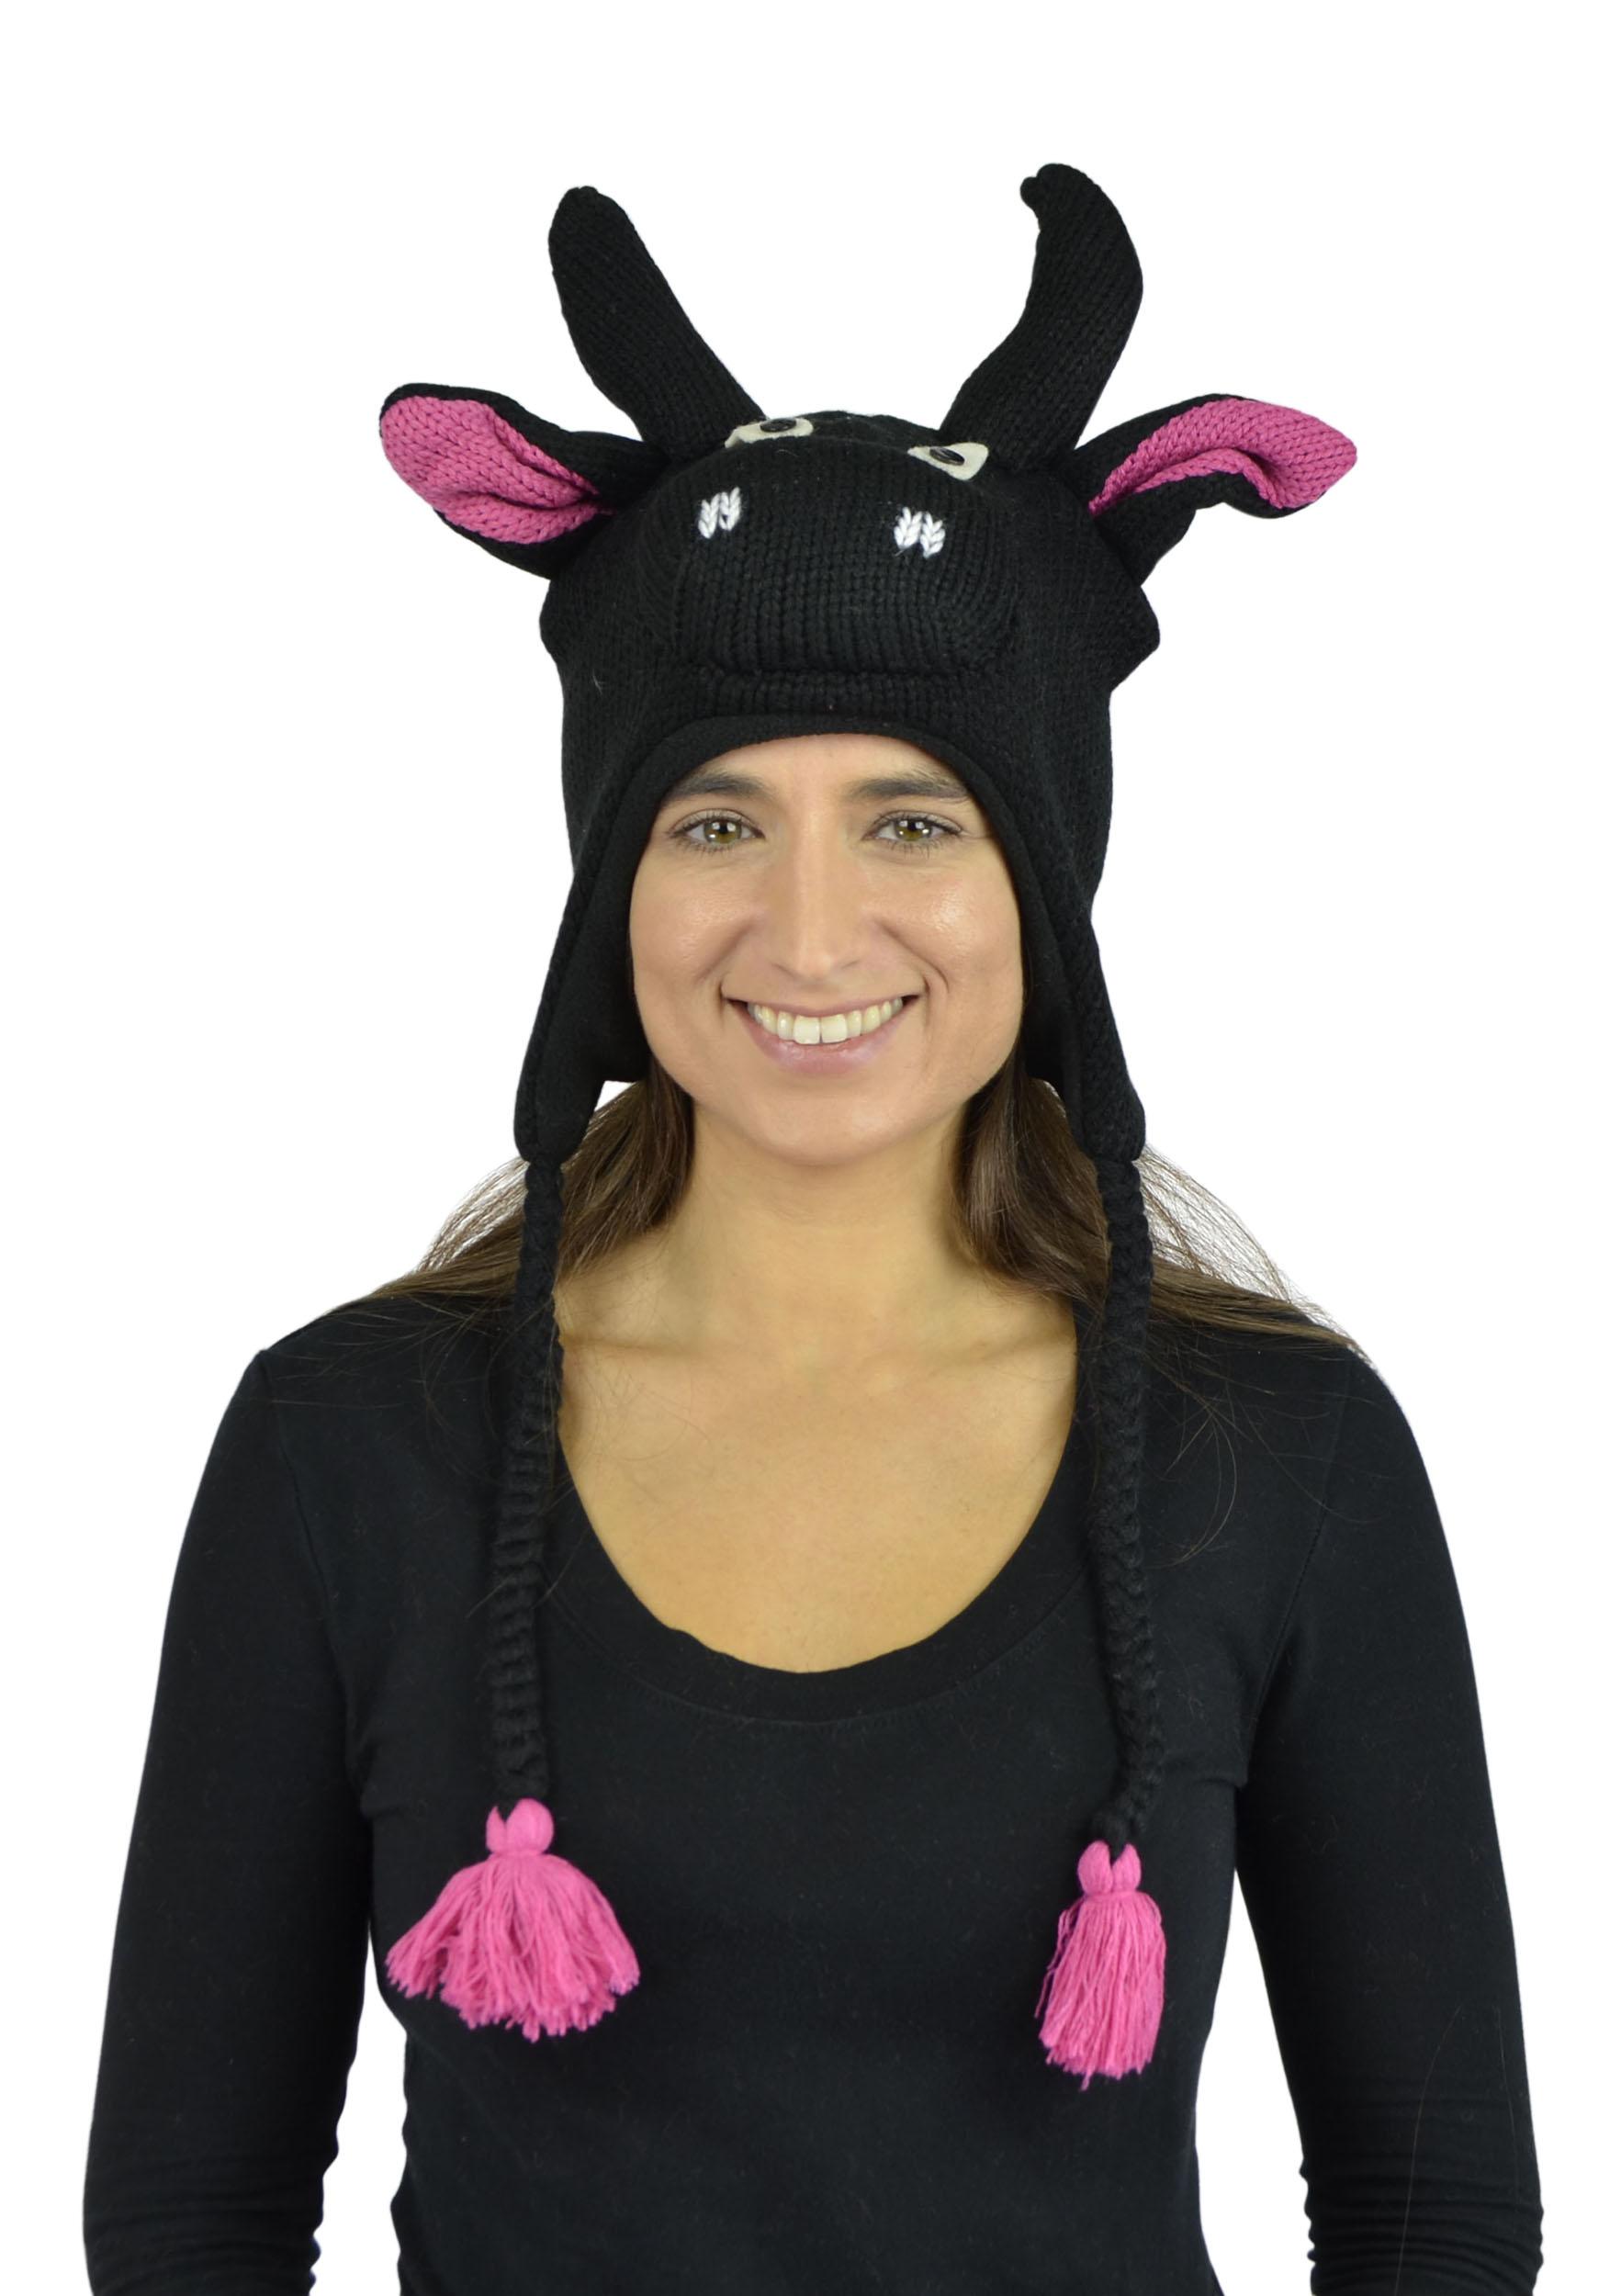 Belle Donne - Unisex Winter Knit Bull Animal Hats with Pom Pom - Black